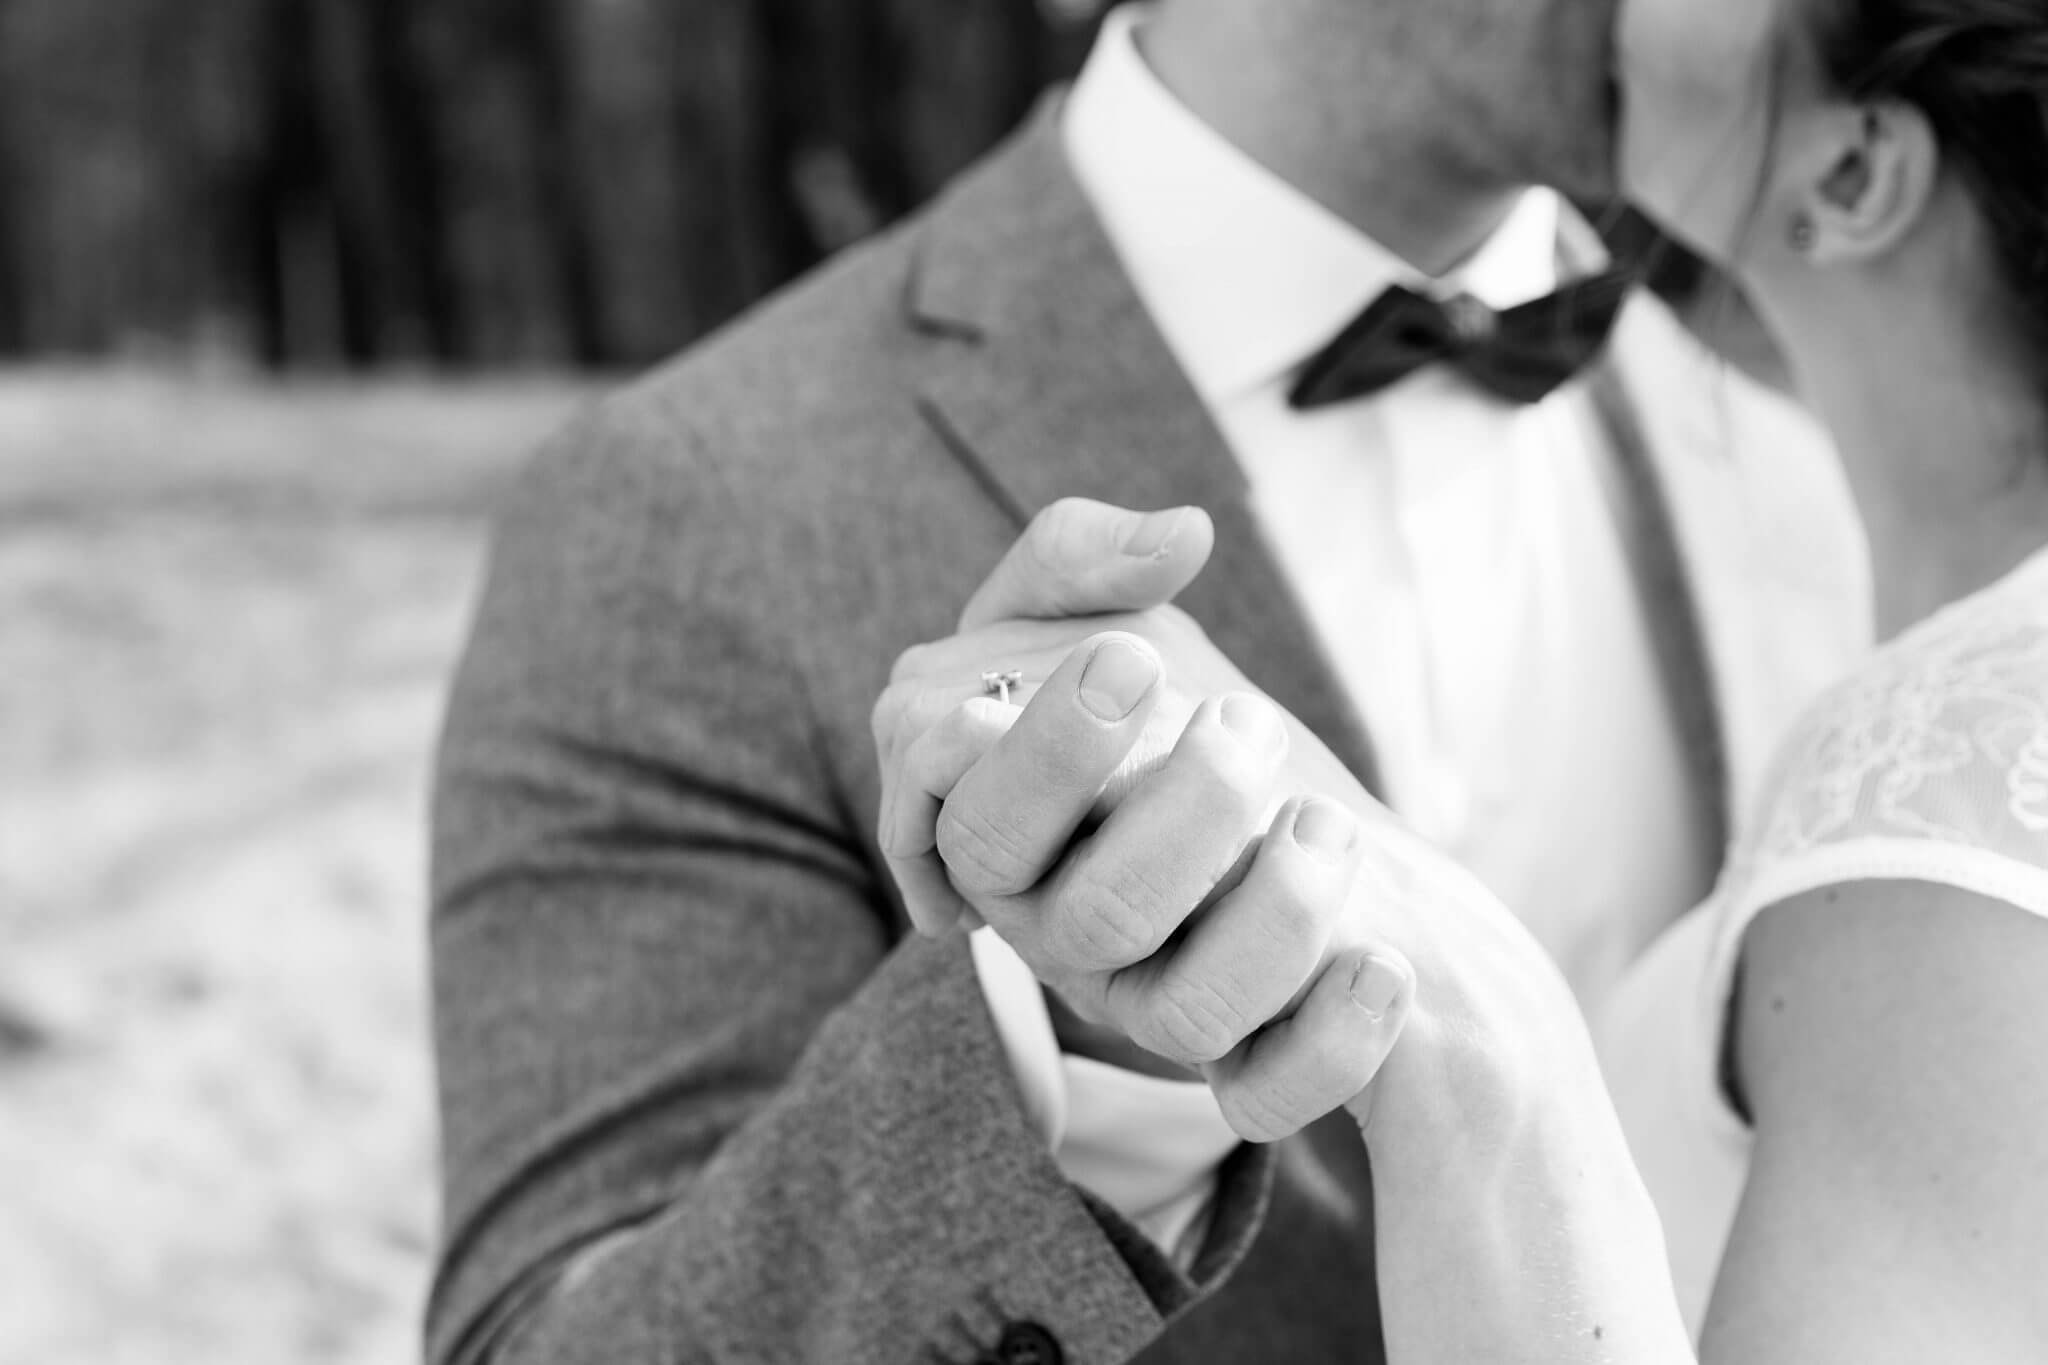 Bruidsfotograaf Zuidhorn, Bruidsfotografie Zuidhorn, Bruidsfotograaf Groningen, Bruidsfotografie Groningen, Lijn 10, Fotograaf Groningen, Fotograaf Zuidhorn, Trouwen in Groningen, Trouwen in Zuidhorn